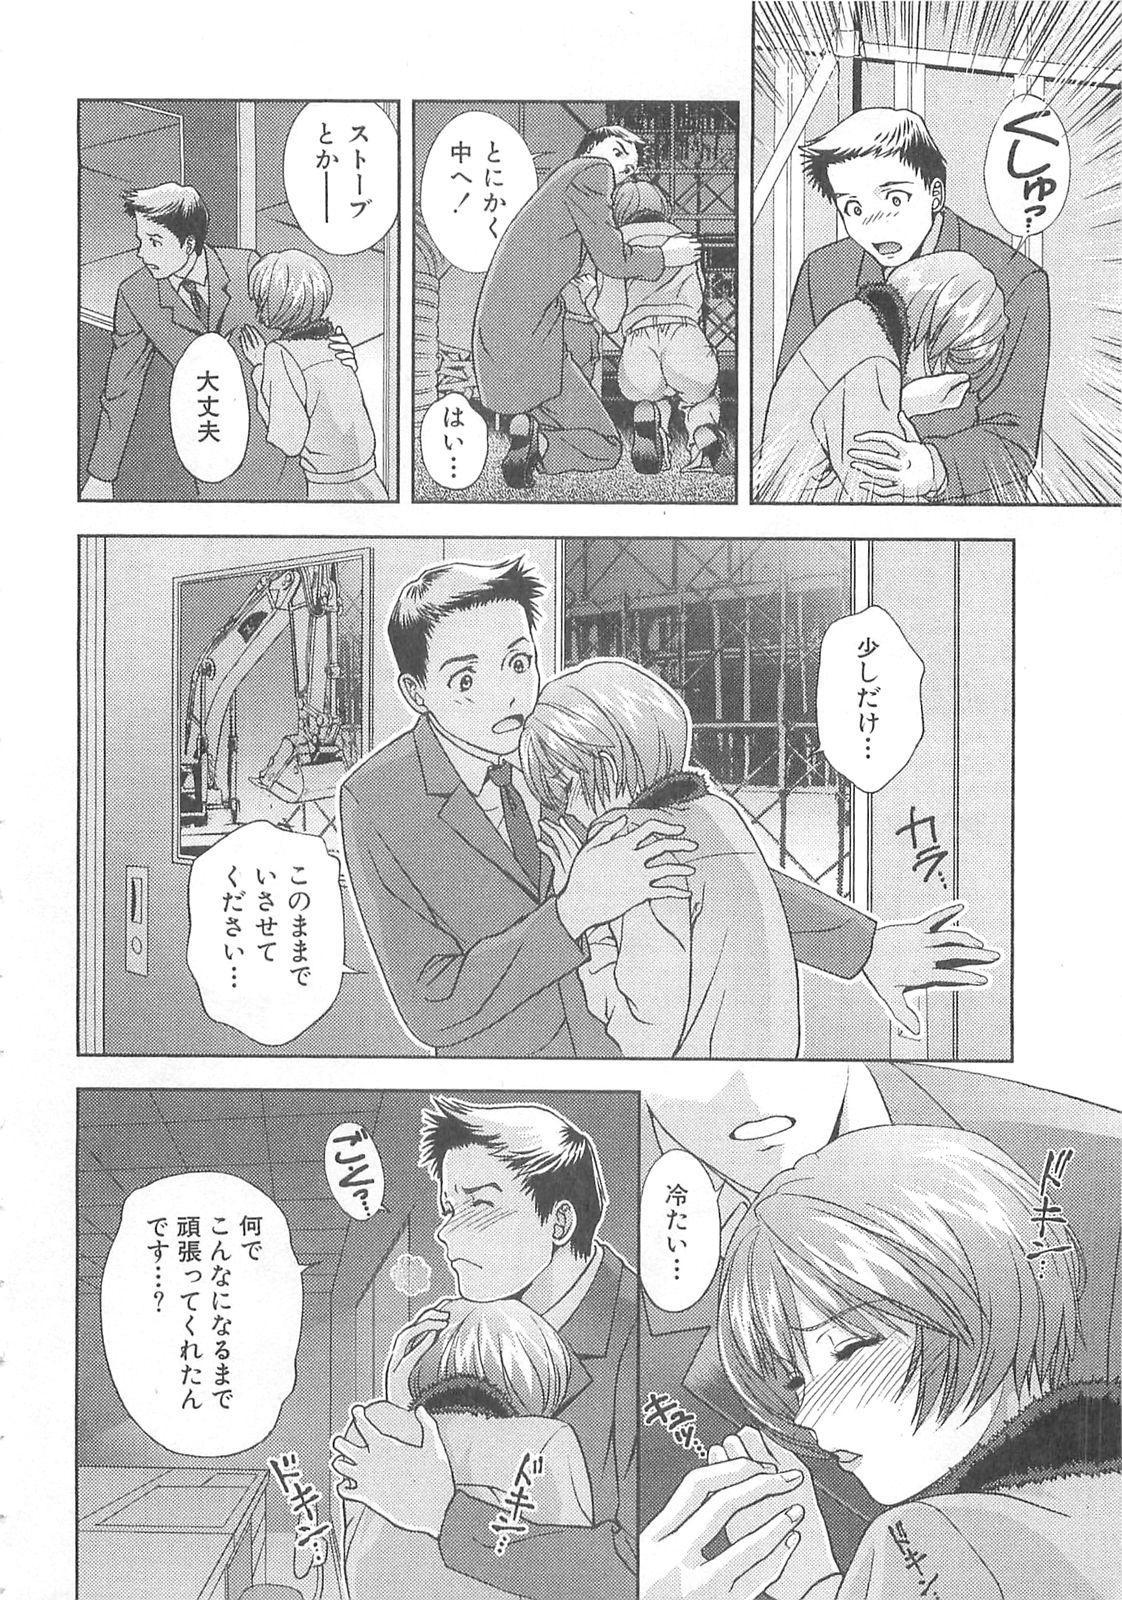 Tenshi no Kyuu - Angel's Pretty Hip 152